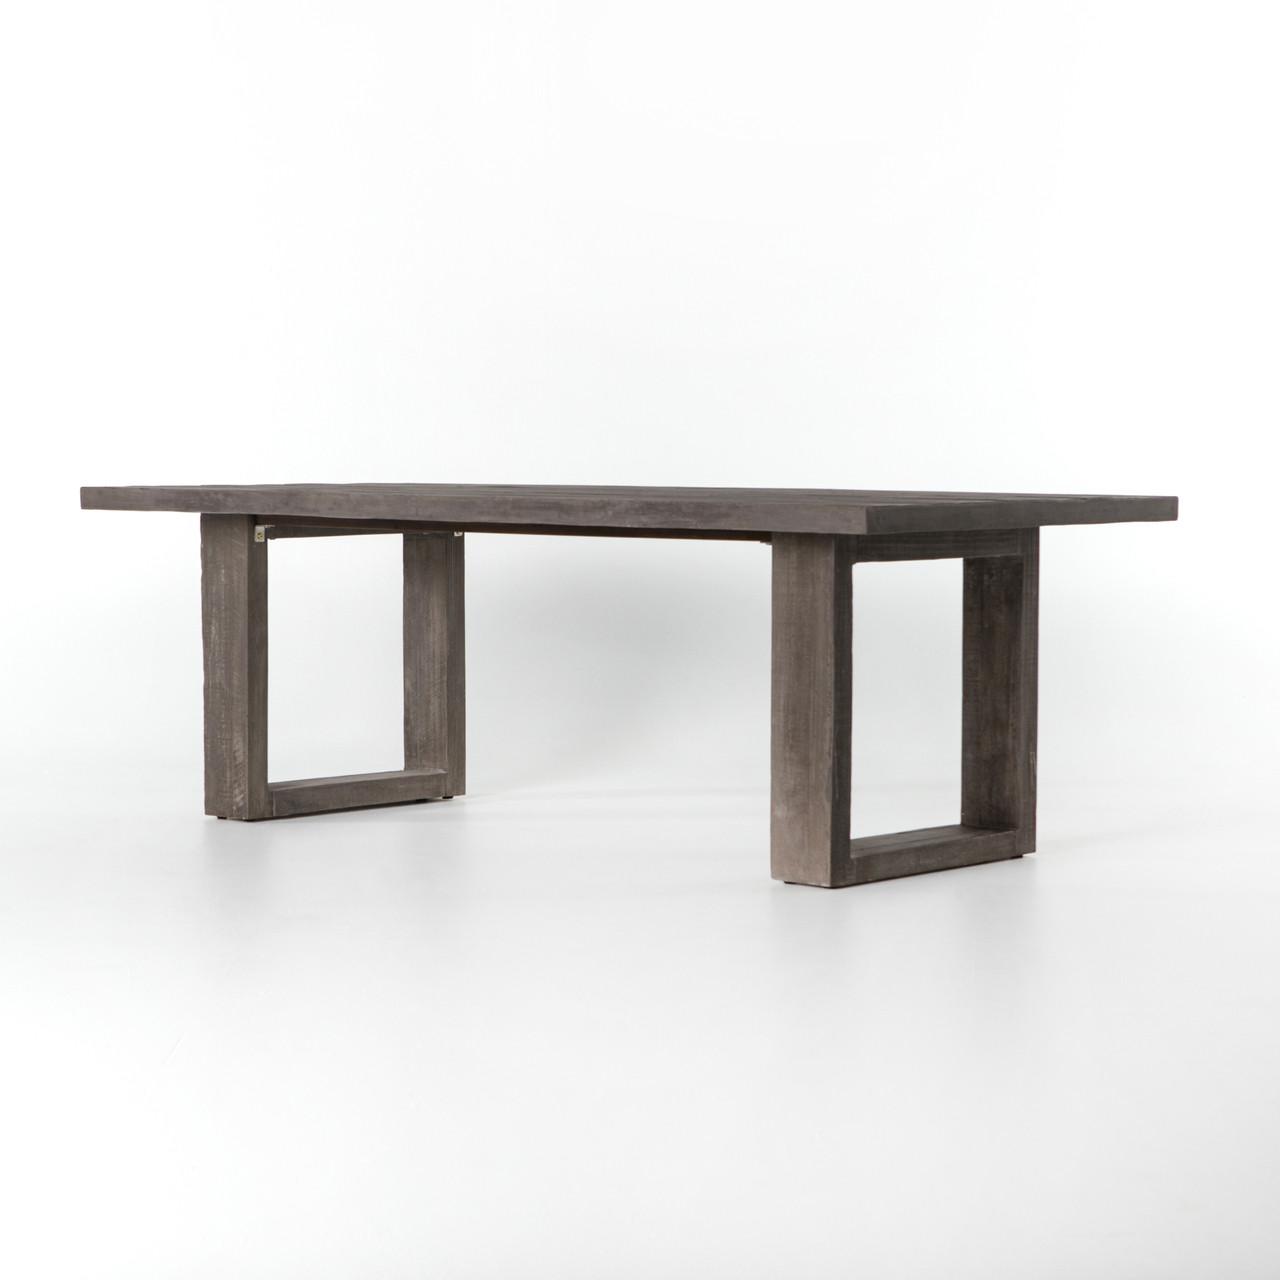 concrete outdoor dining table. Faux Bois Concrete Outdoor Dining Table T